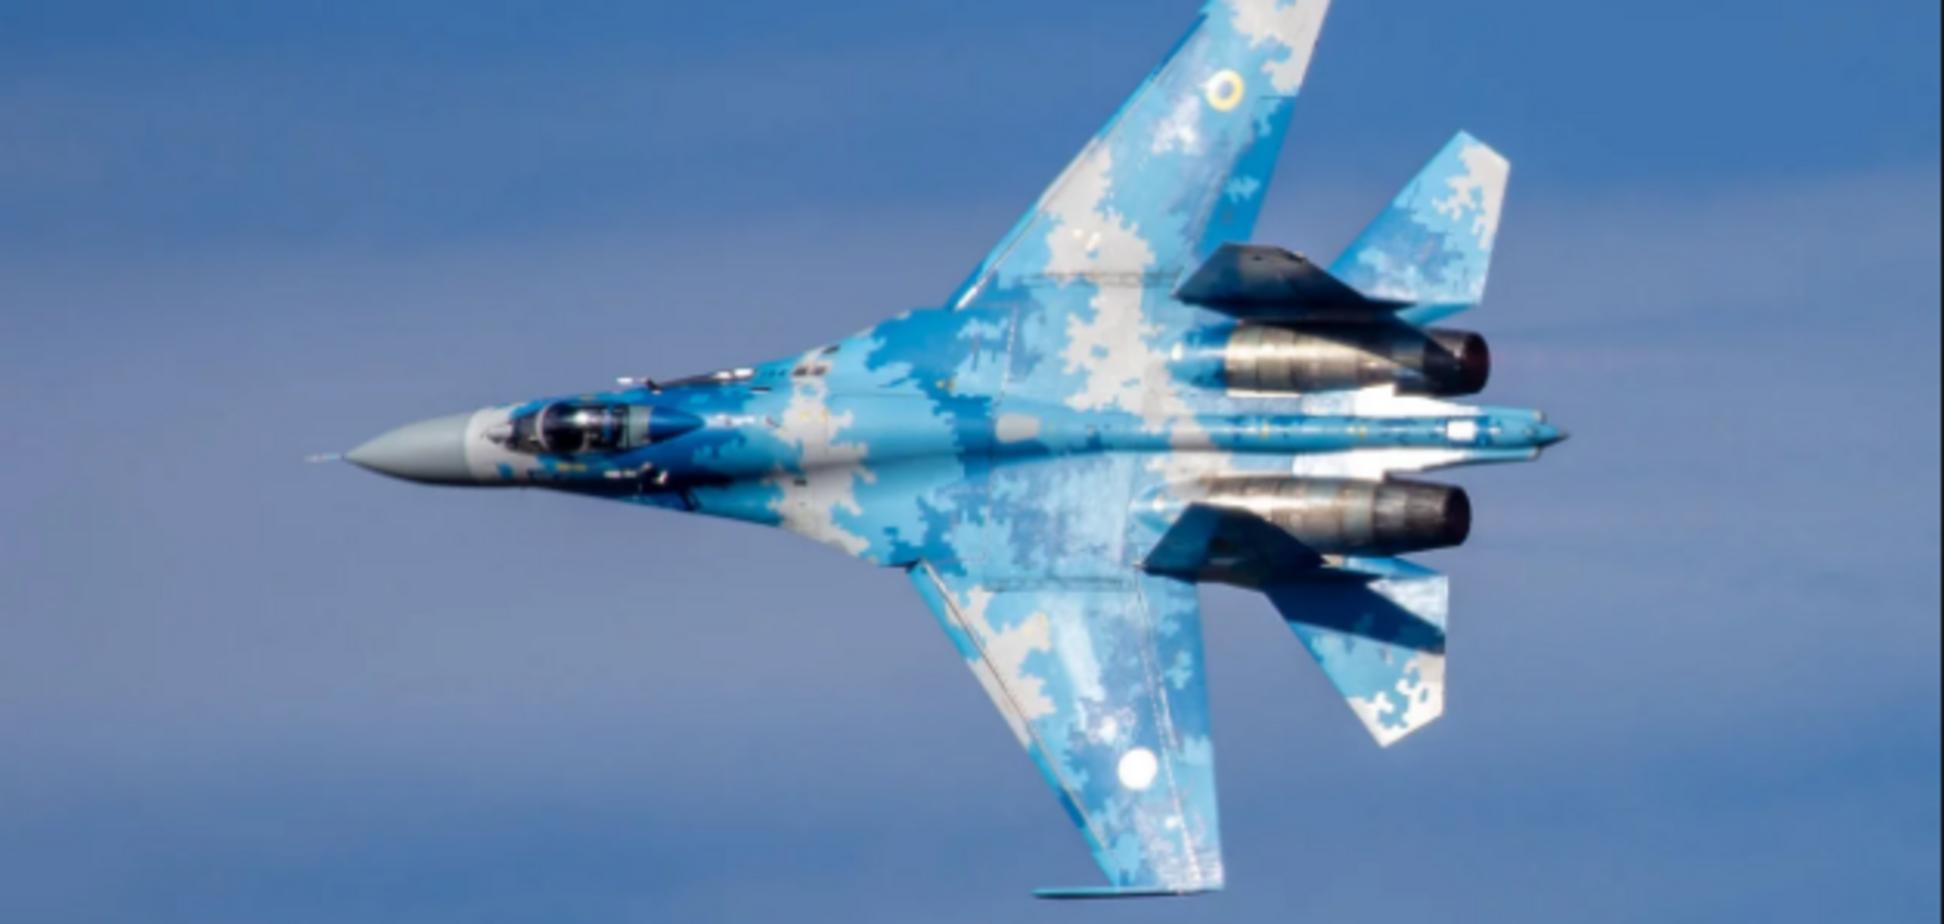 Катастрофа Су-27: самолет за 30 лет изрядно устарел